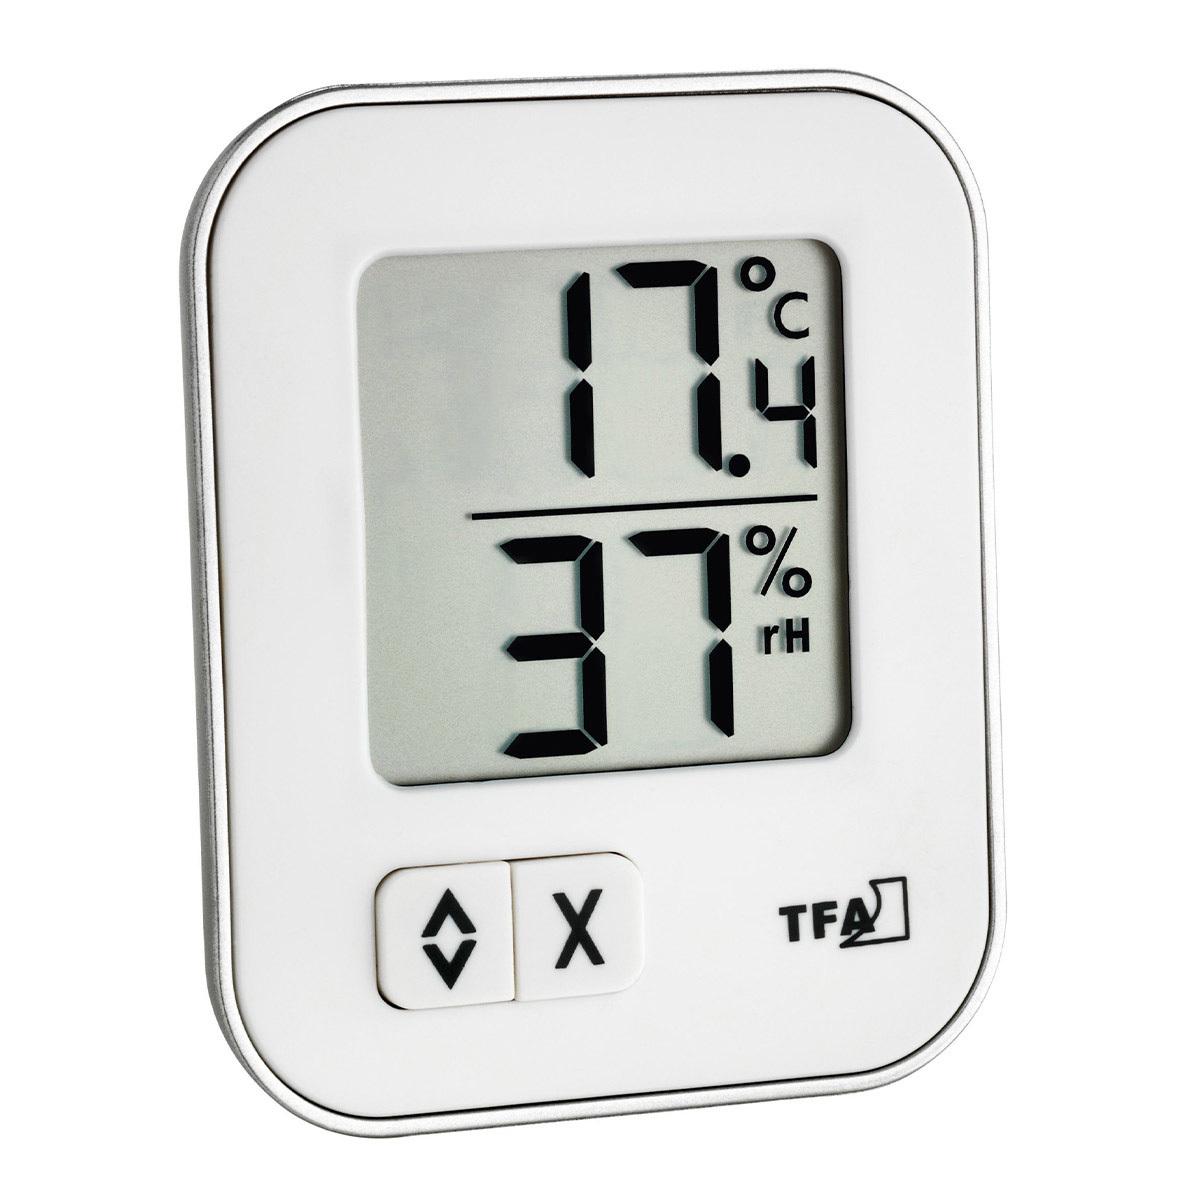 30-5026-02-digitales-thermo-hygrometer-moxx-1200x1200px.jpg